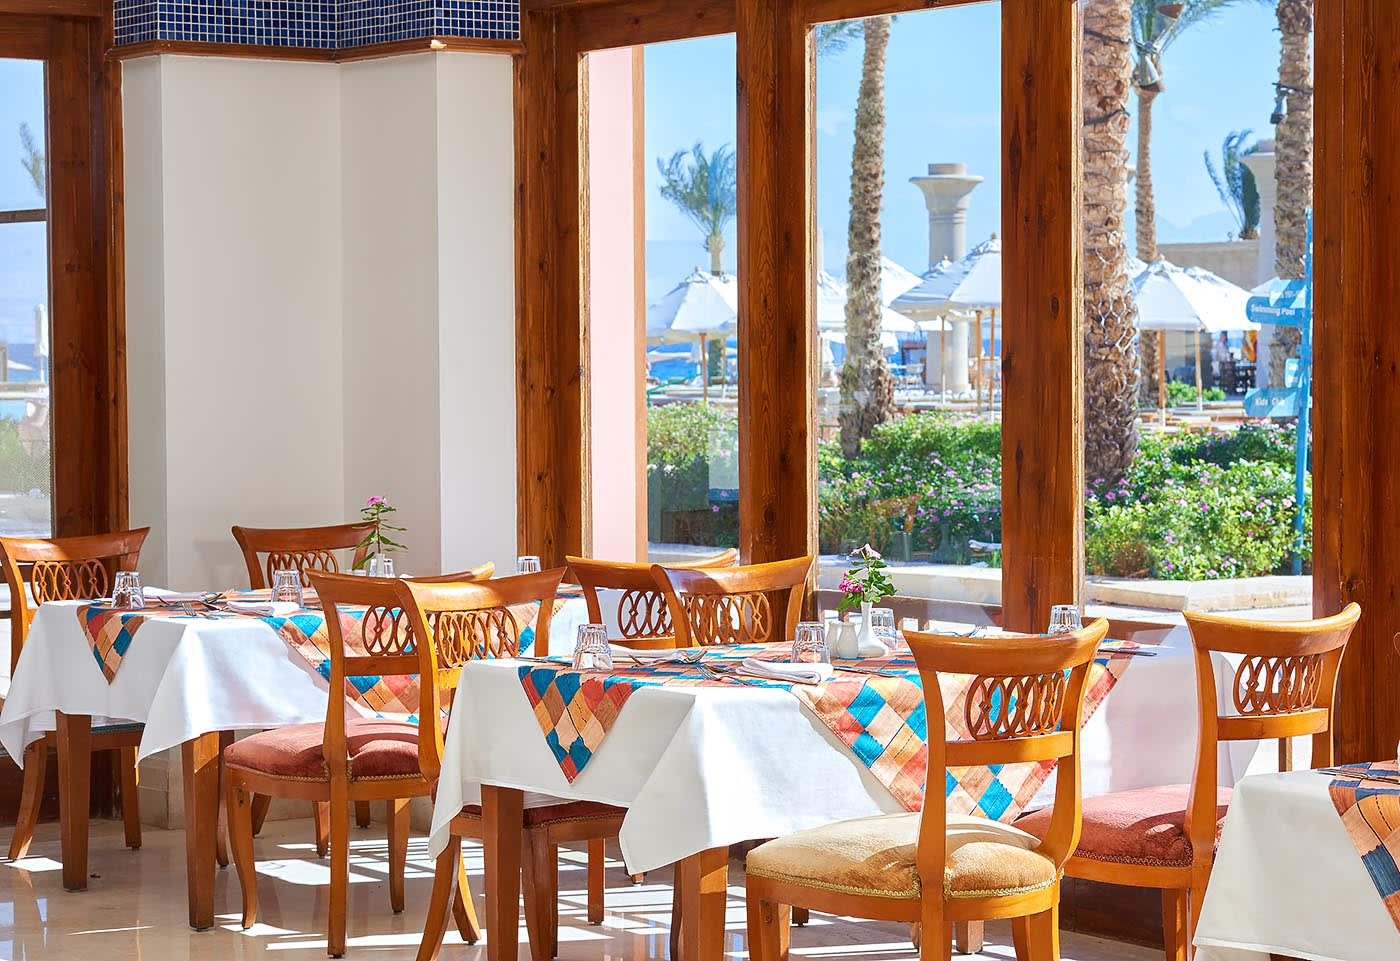 Sofitel Taba beach resort mediterranean Restaurant - Mohamed Abdel-Hady Photography